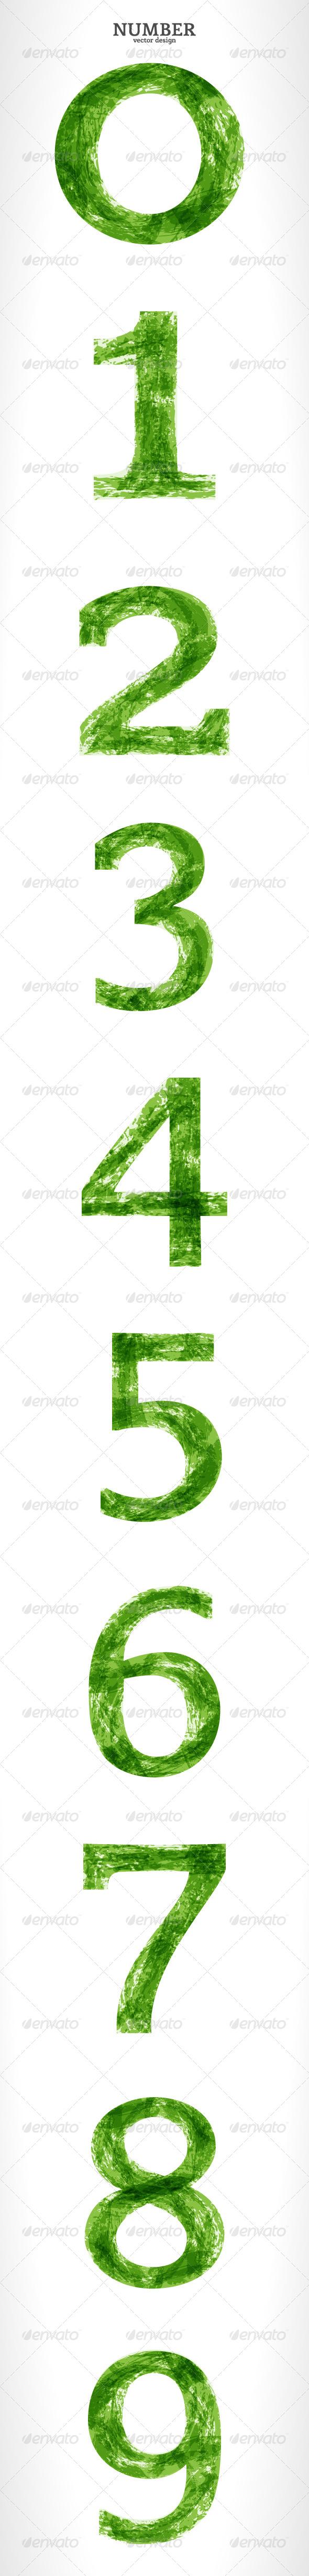 Grunge Vector Number